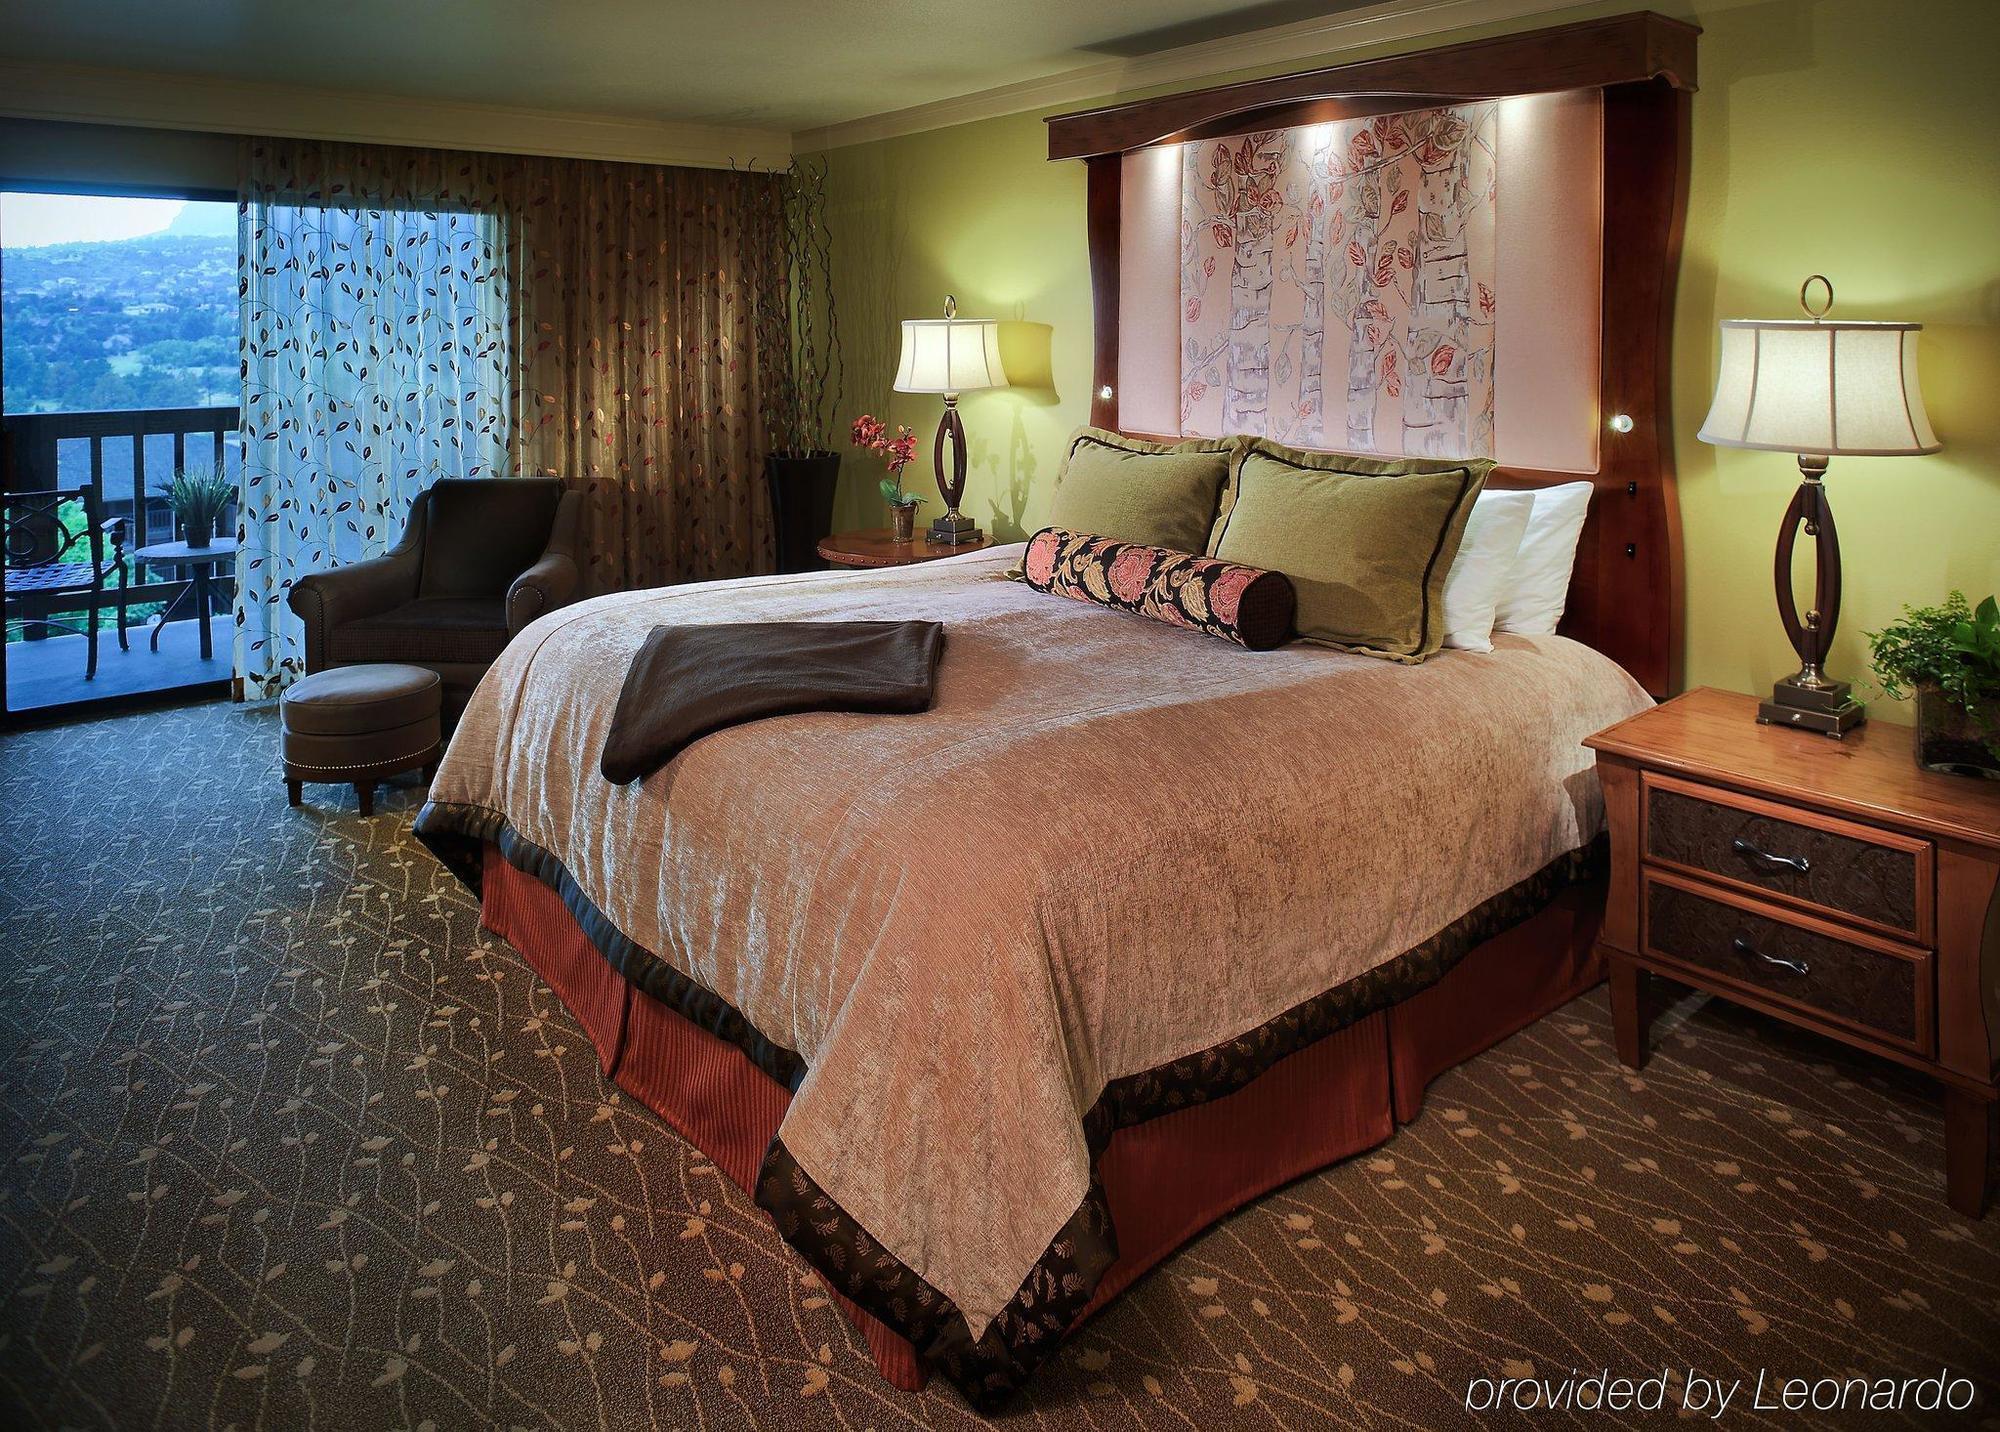 cheyenne mountain resort, colorado springs ****